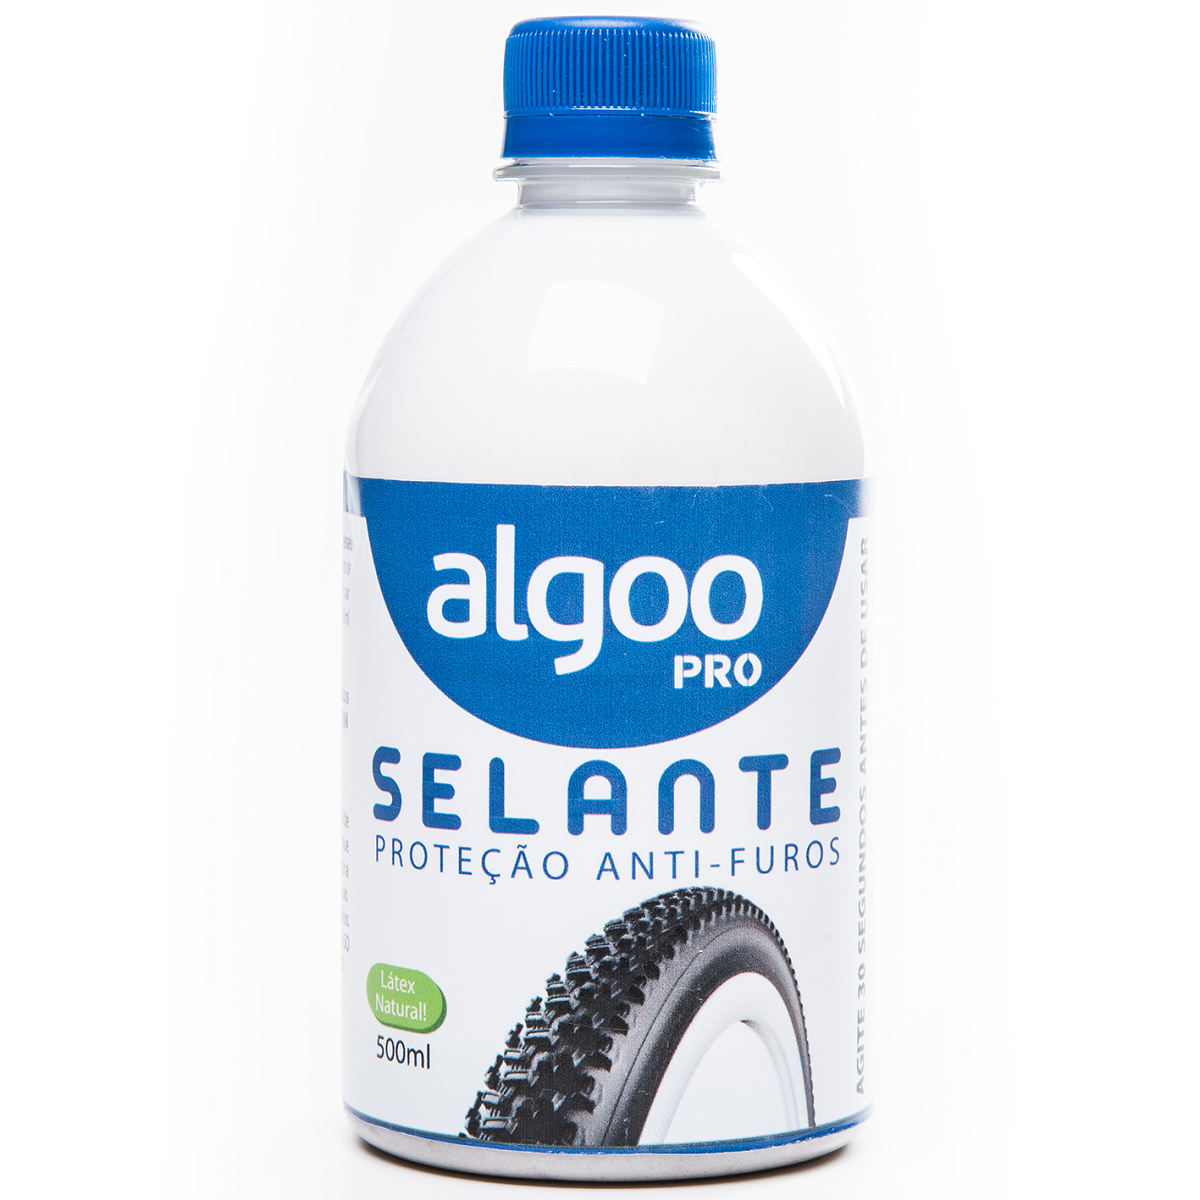 Selante P/ Protecao Anti-Furo, 500Ml